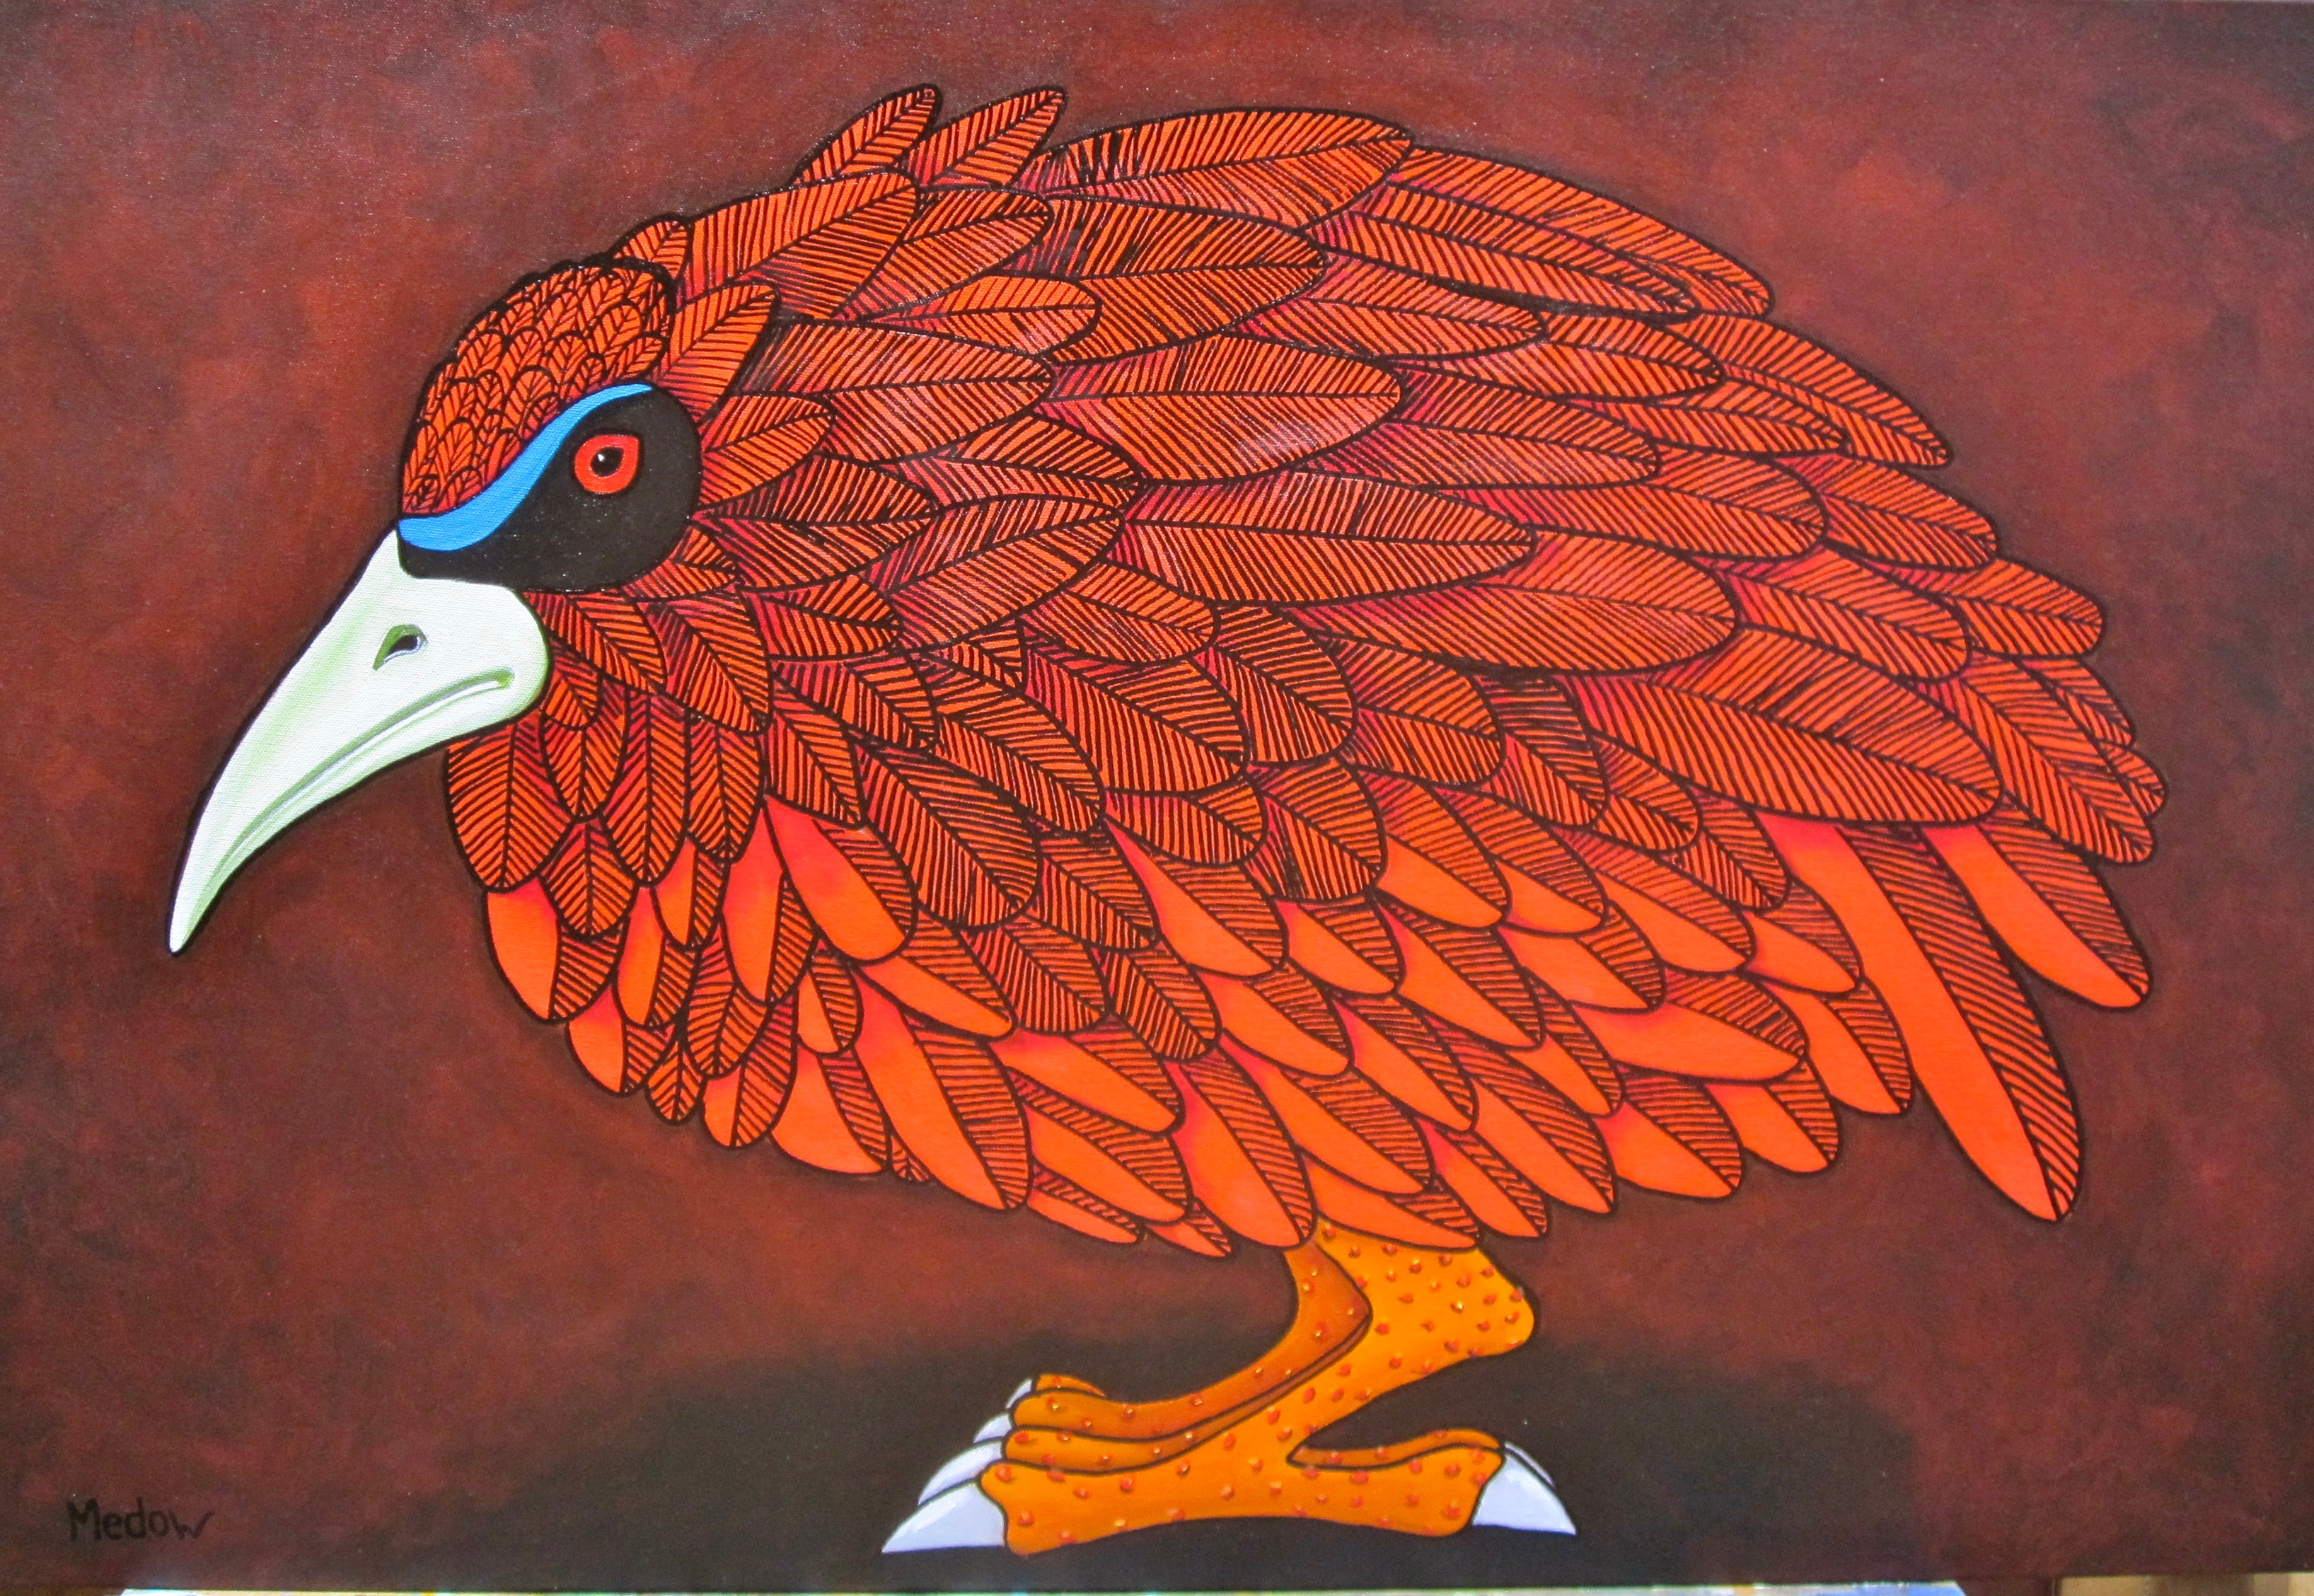 Red Bird by  Mike Medow - Masterpiece Online